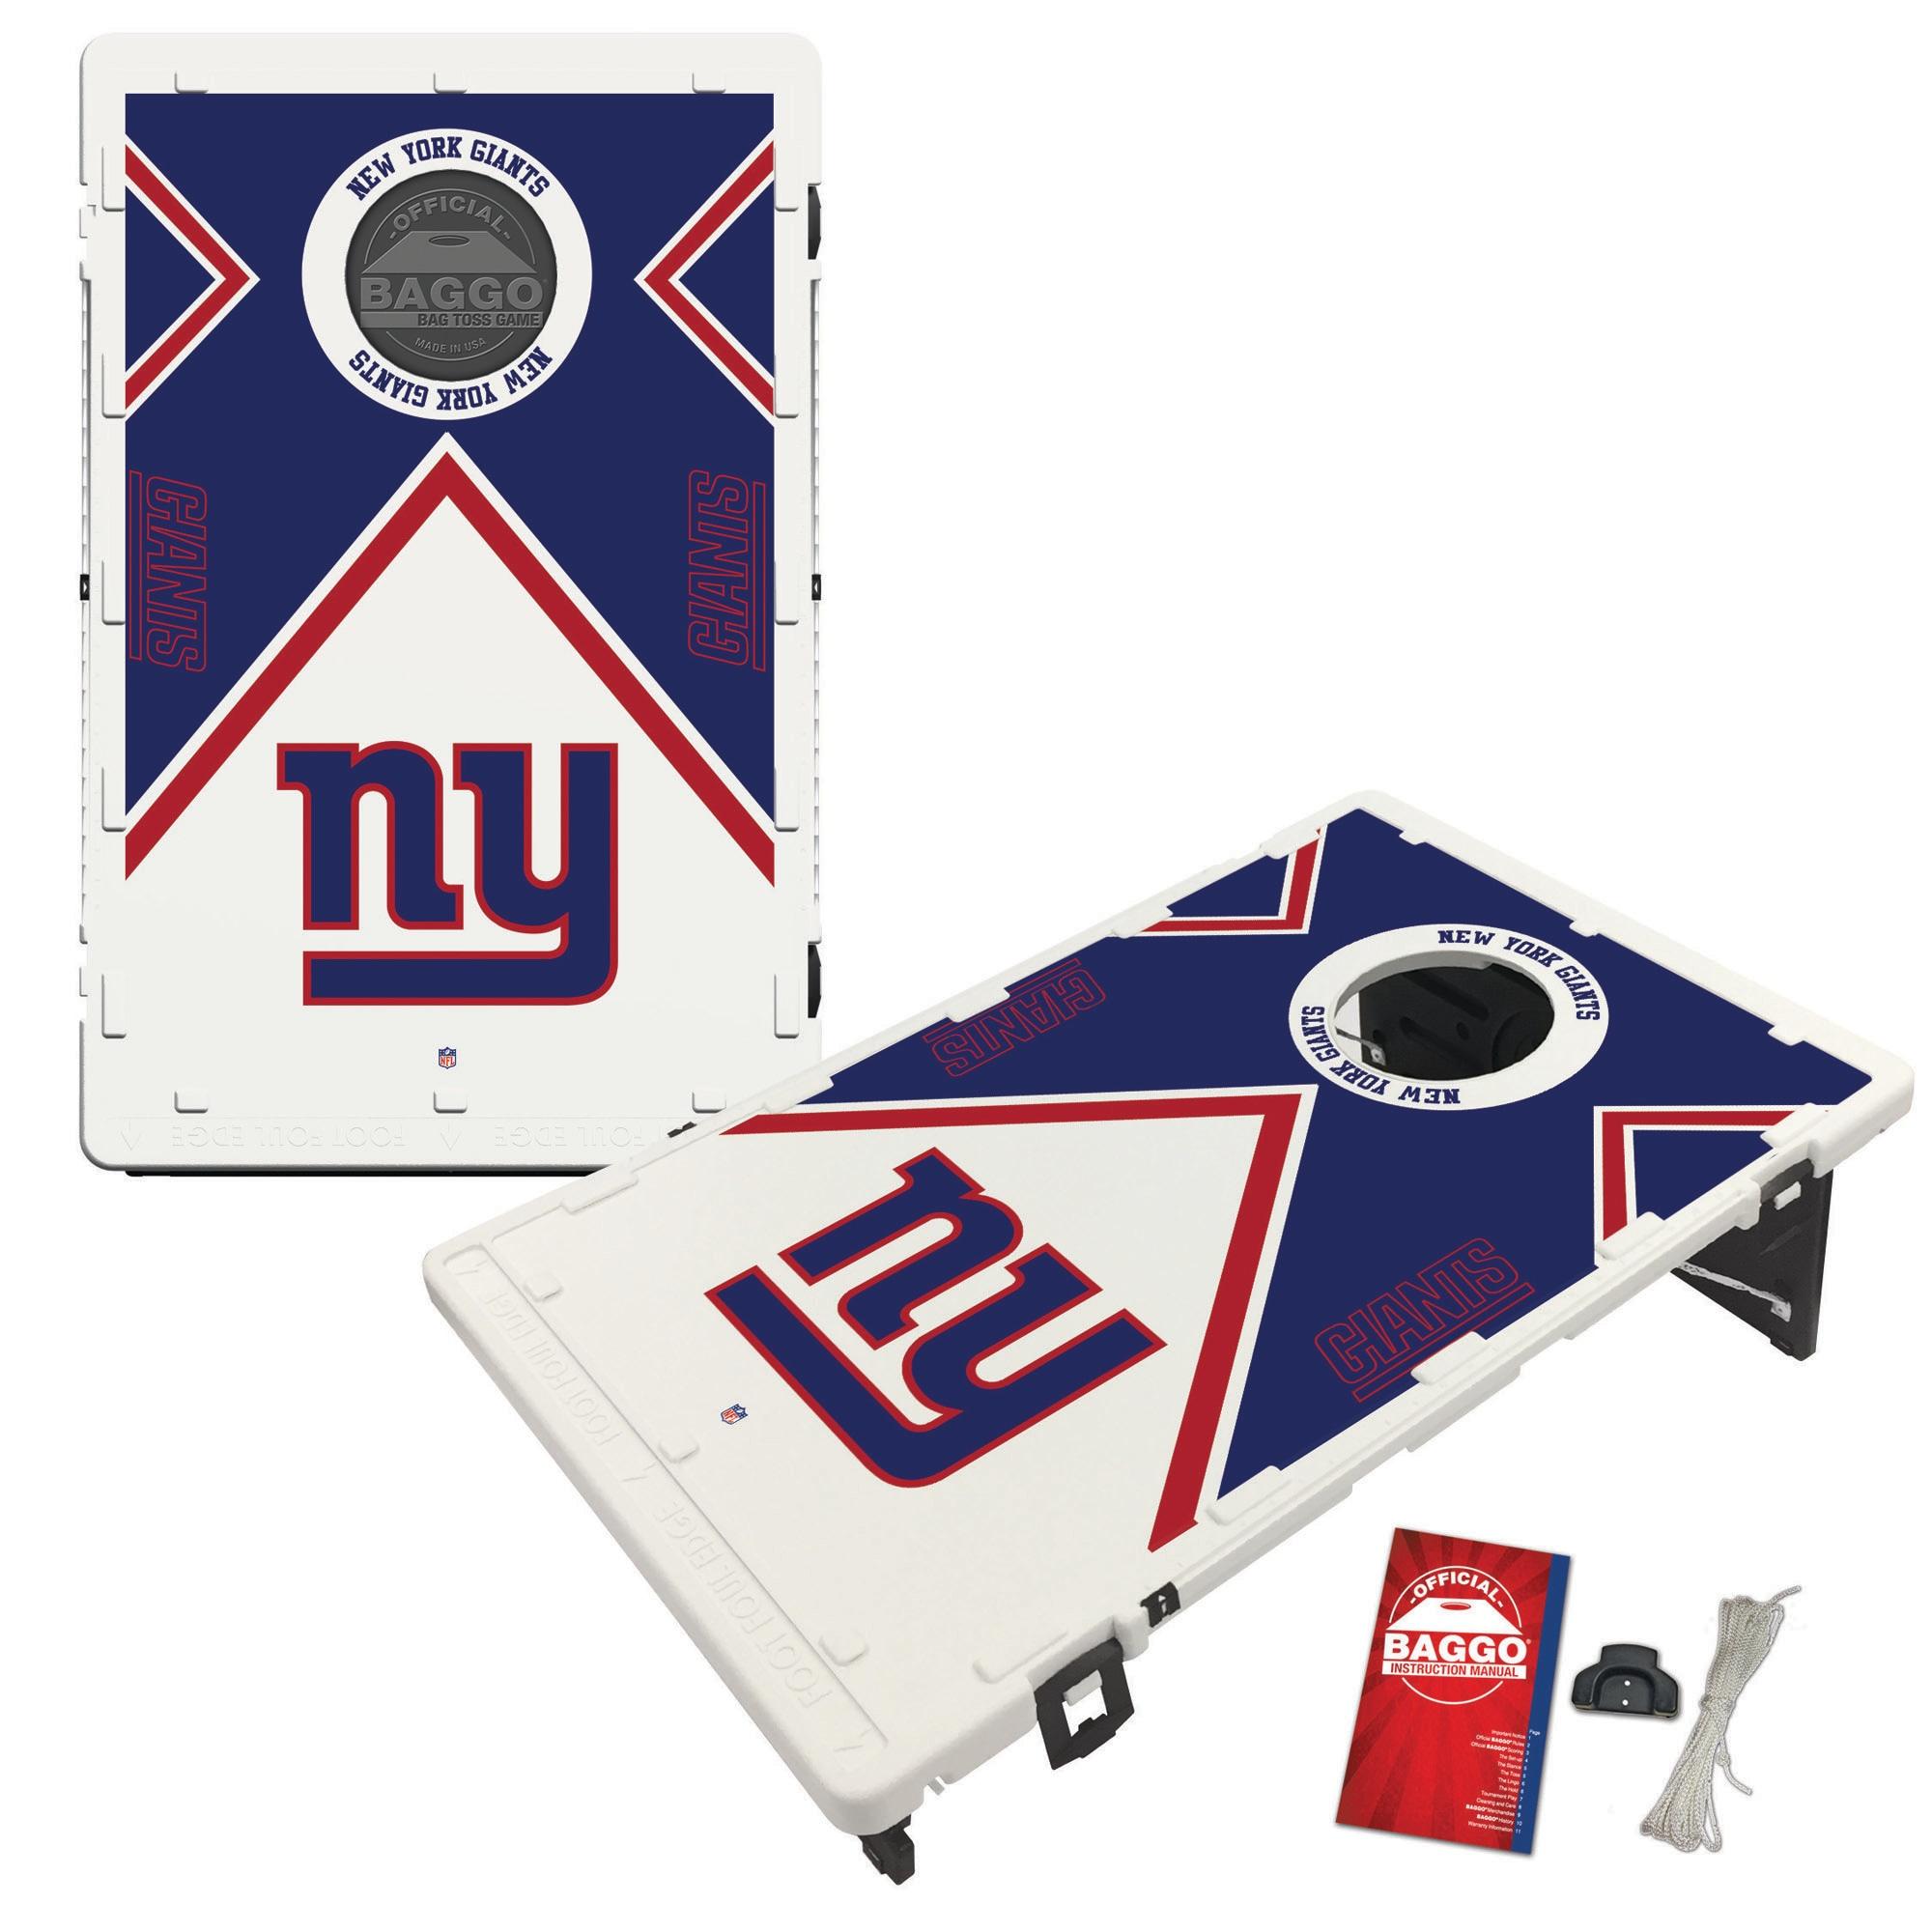 New York Giants 2' x 3' BAGGO Vintage Cornhole Board Tailgate Toss Set